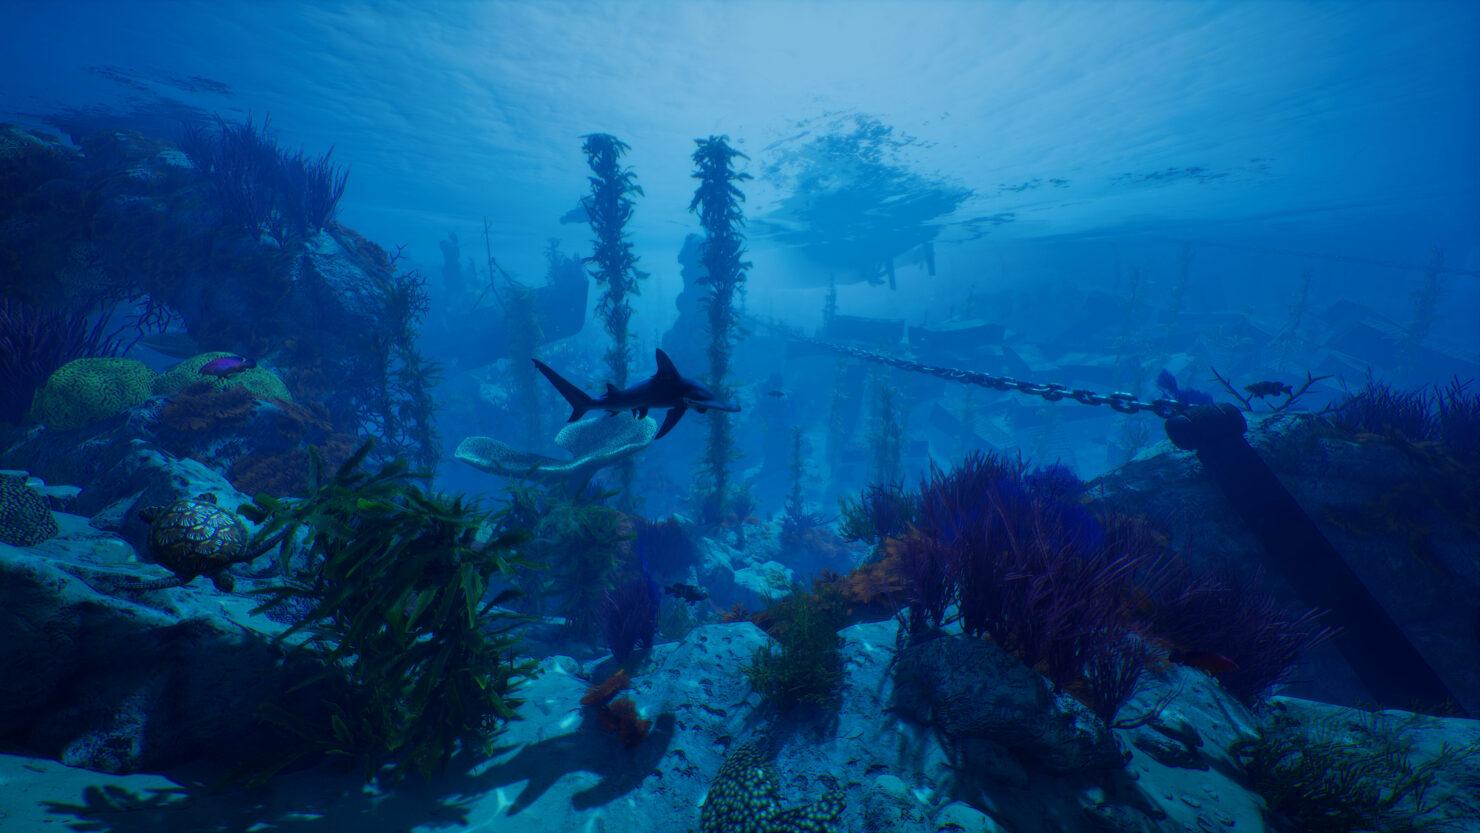 maneater_deepocean2